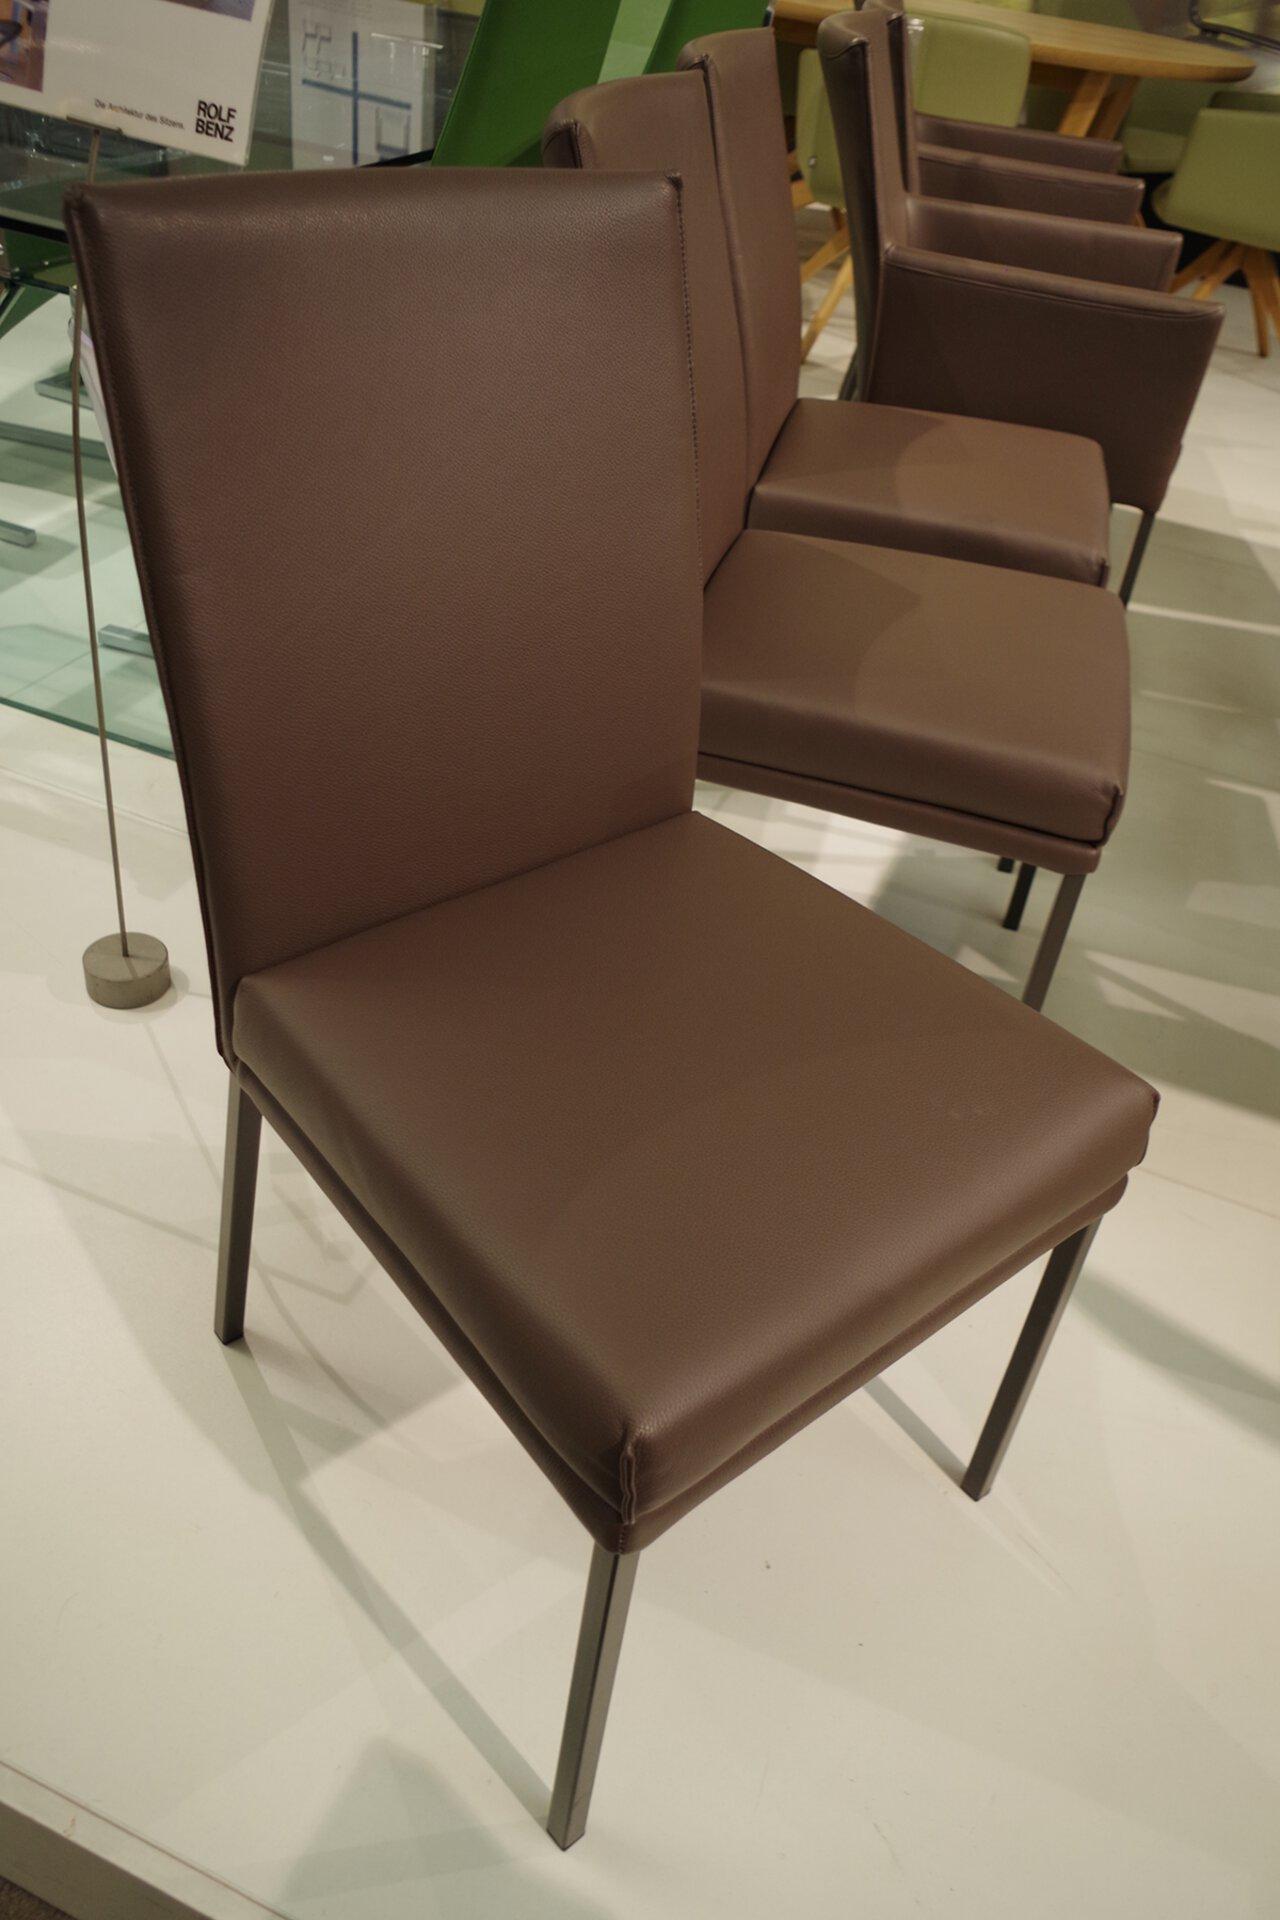 6x Stühle 651